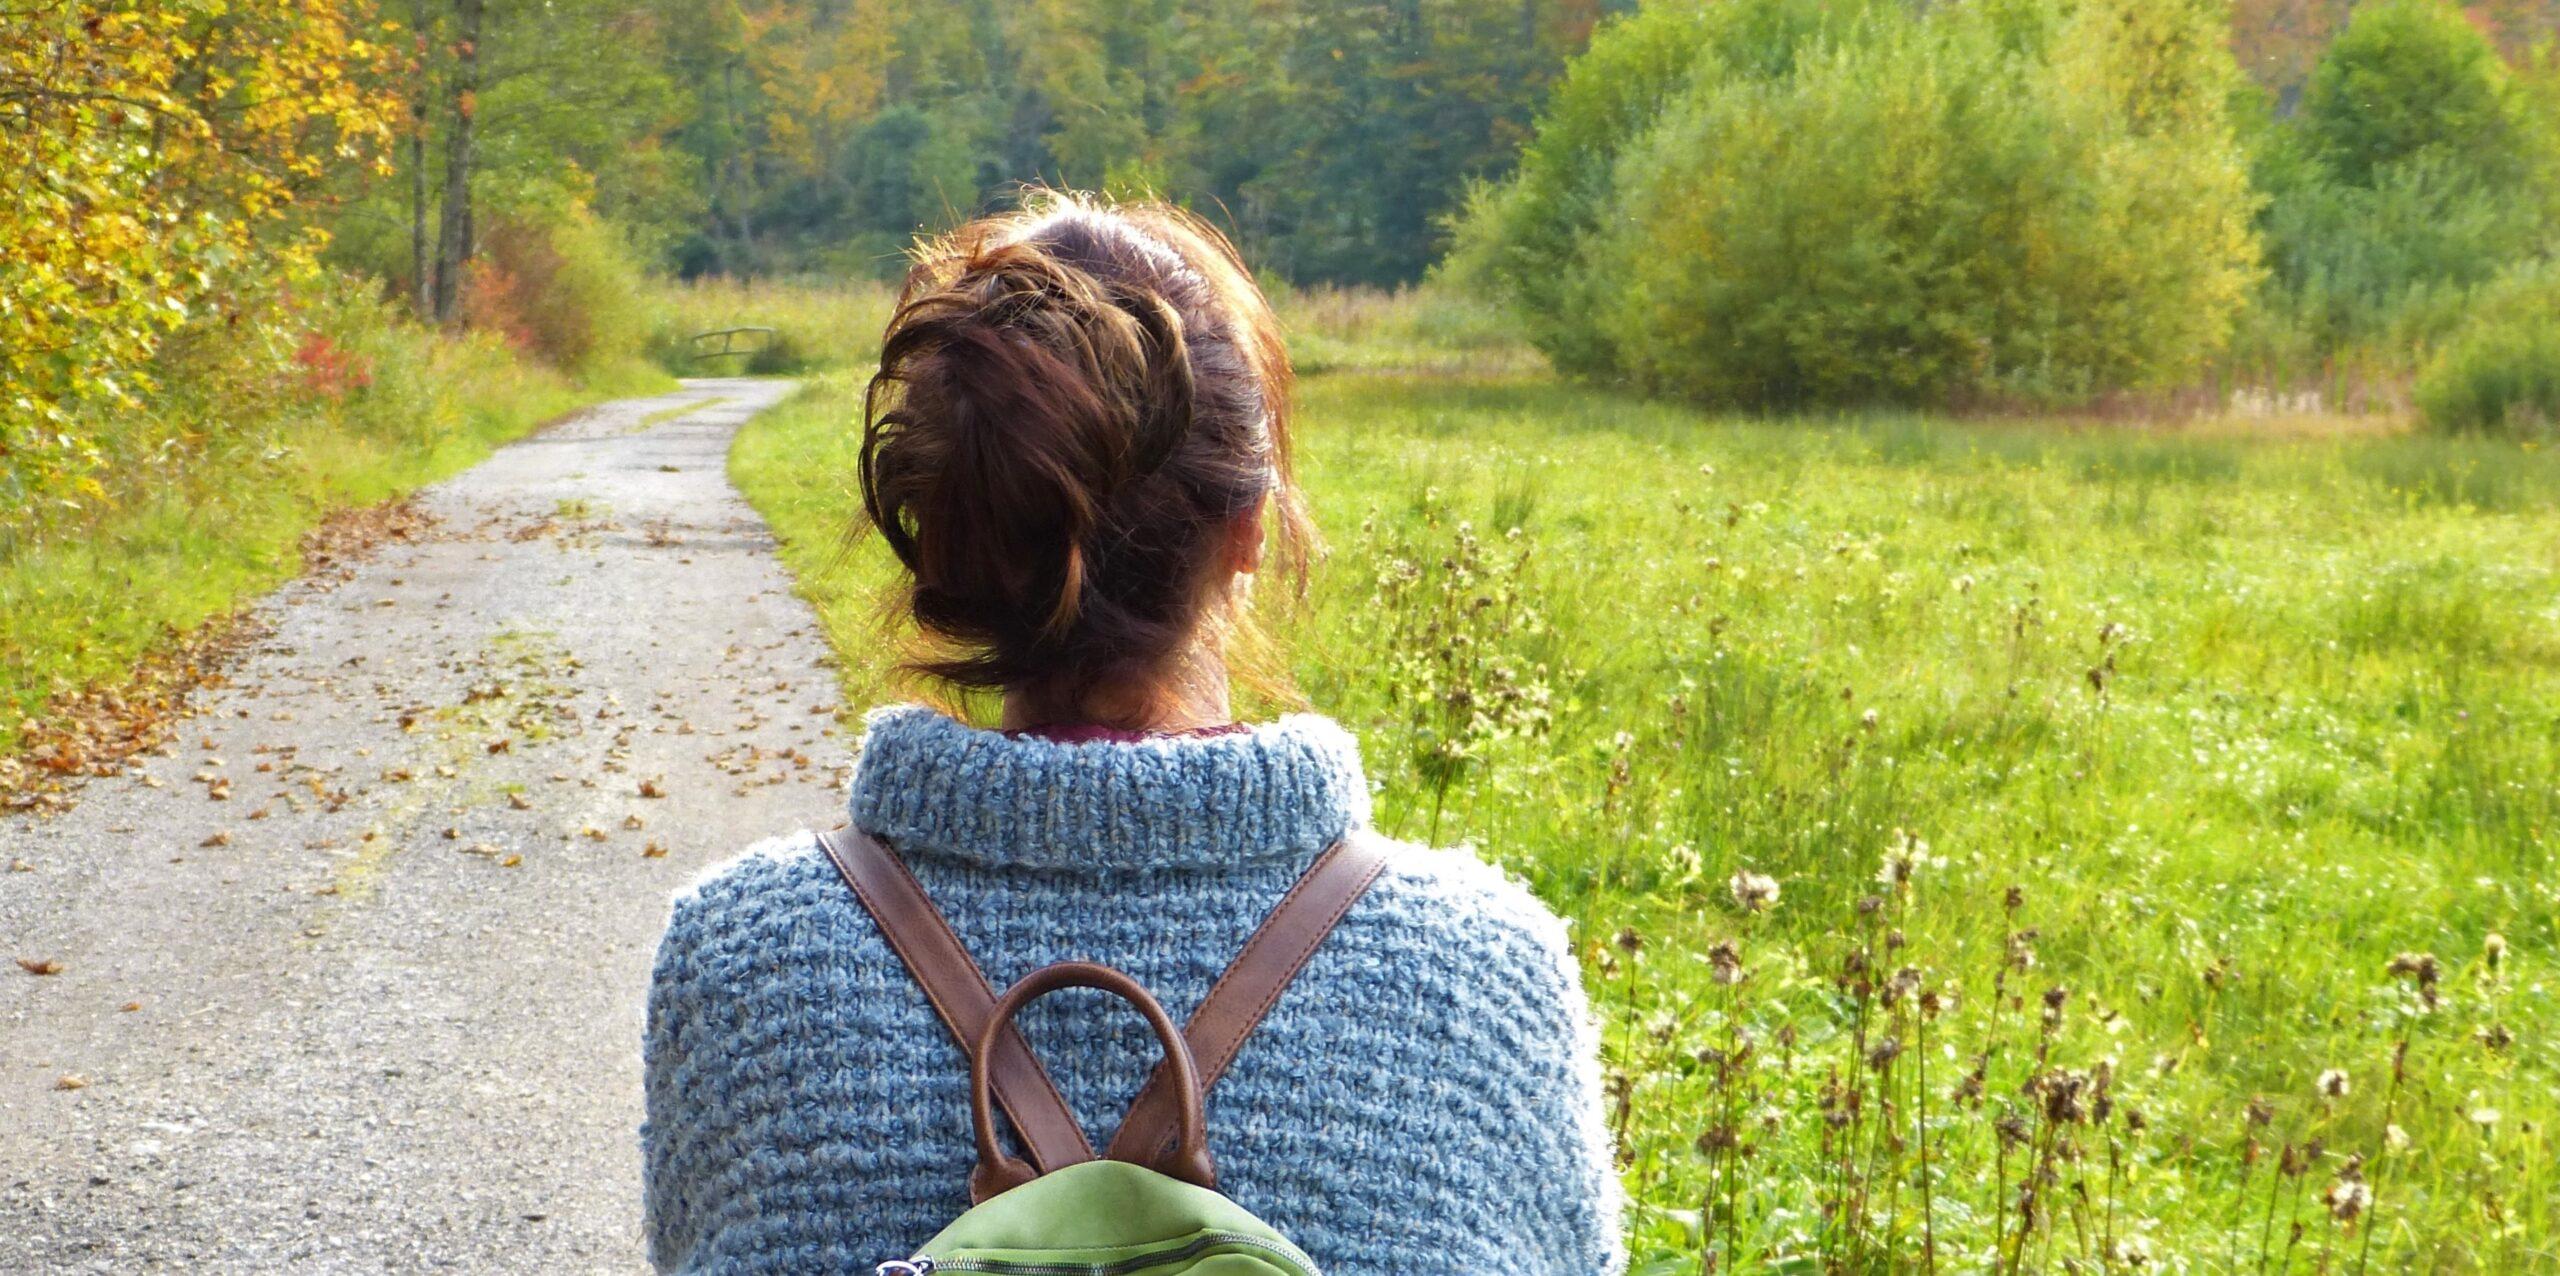 Psychotherapie Kinesiologie Hof an der Saale Döhlau Entspannung Wellness Reiki Ernährungsberatung mindful-aging Jutta Grenz-Greim